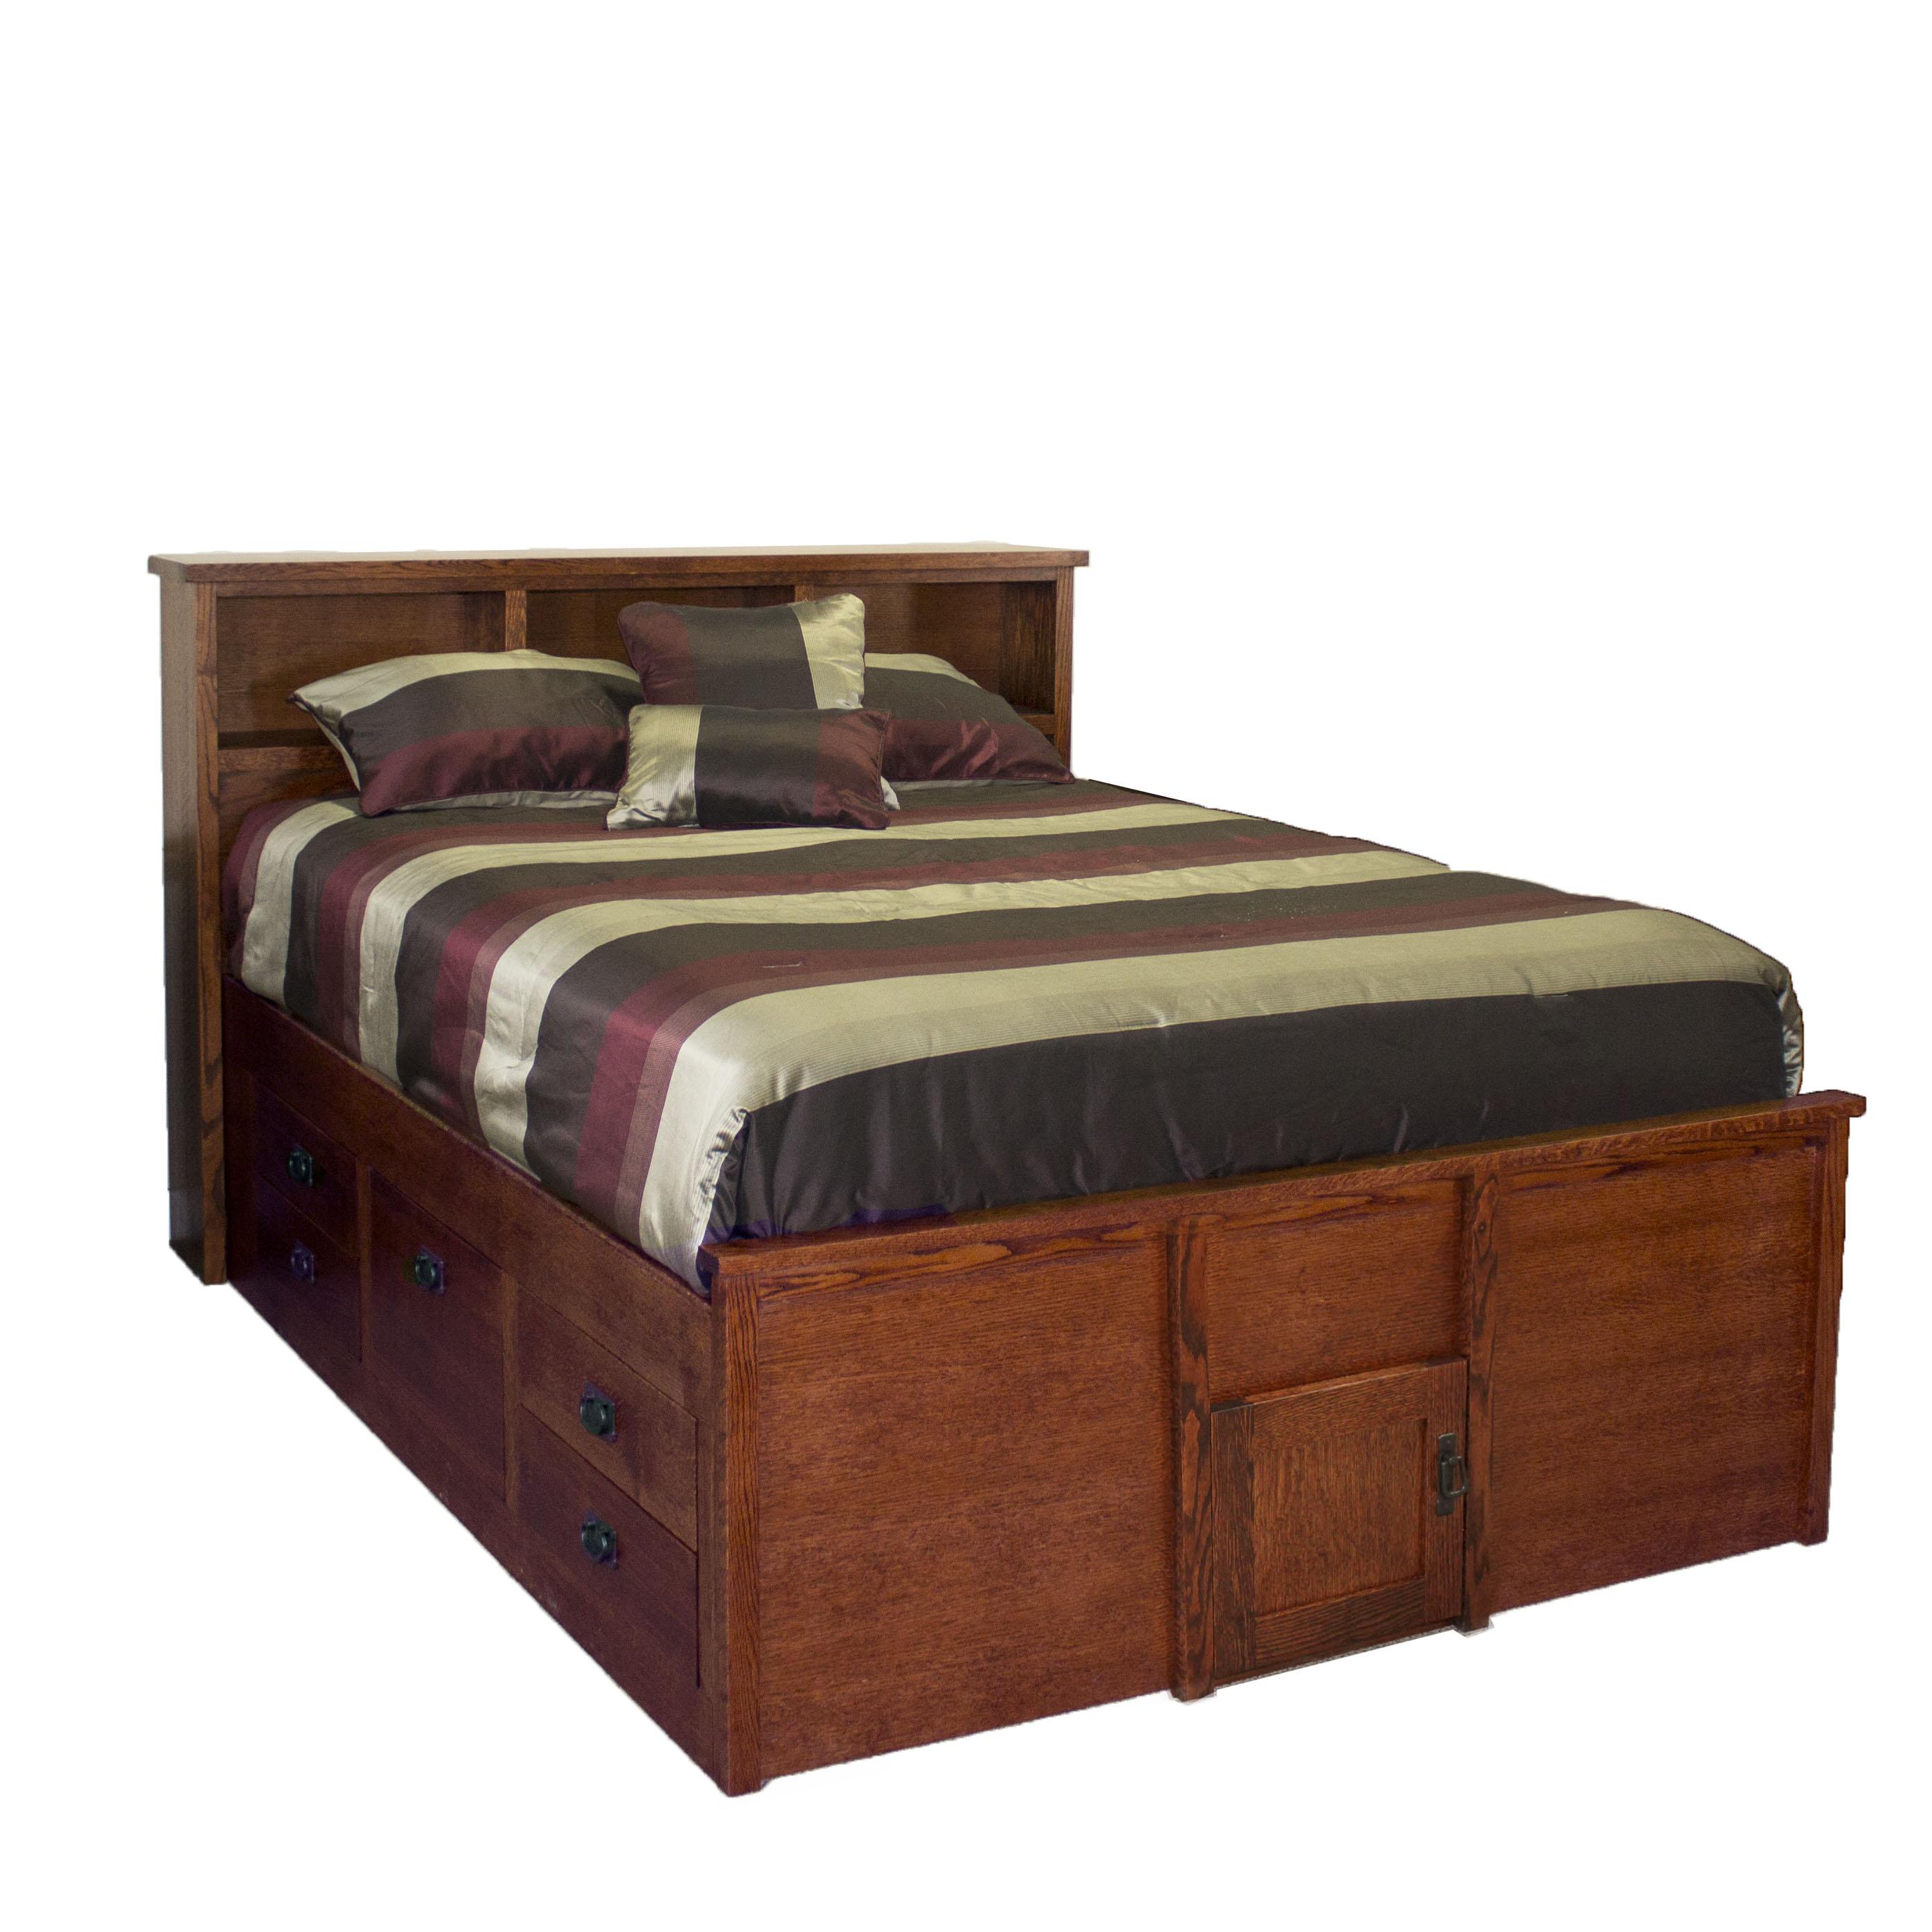 Queen Captains Bed w/ Storage Ftbd